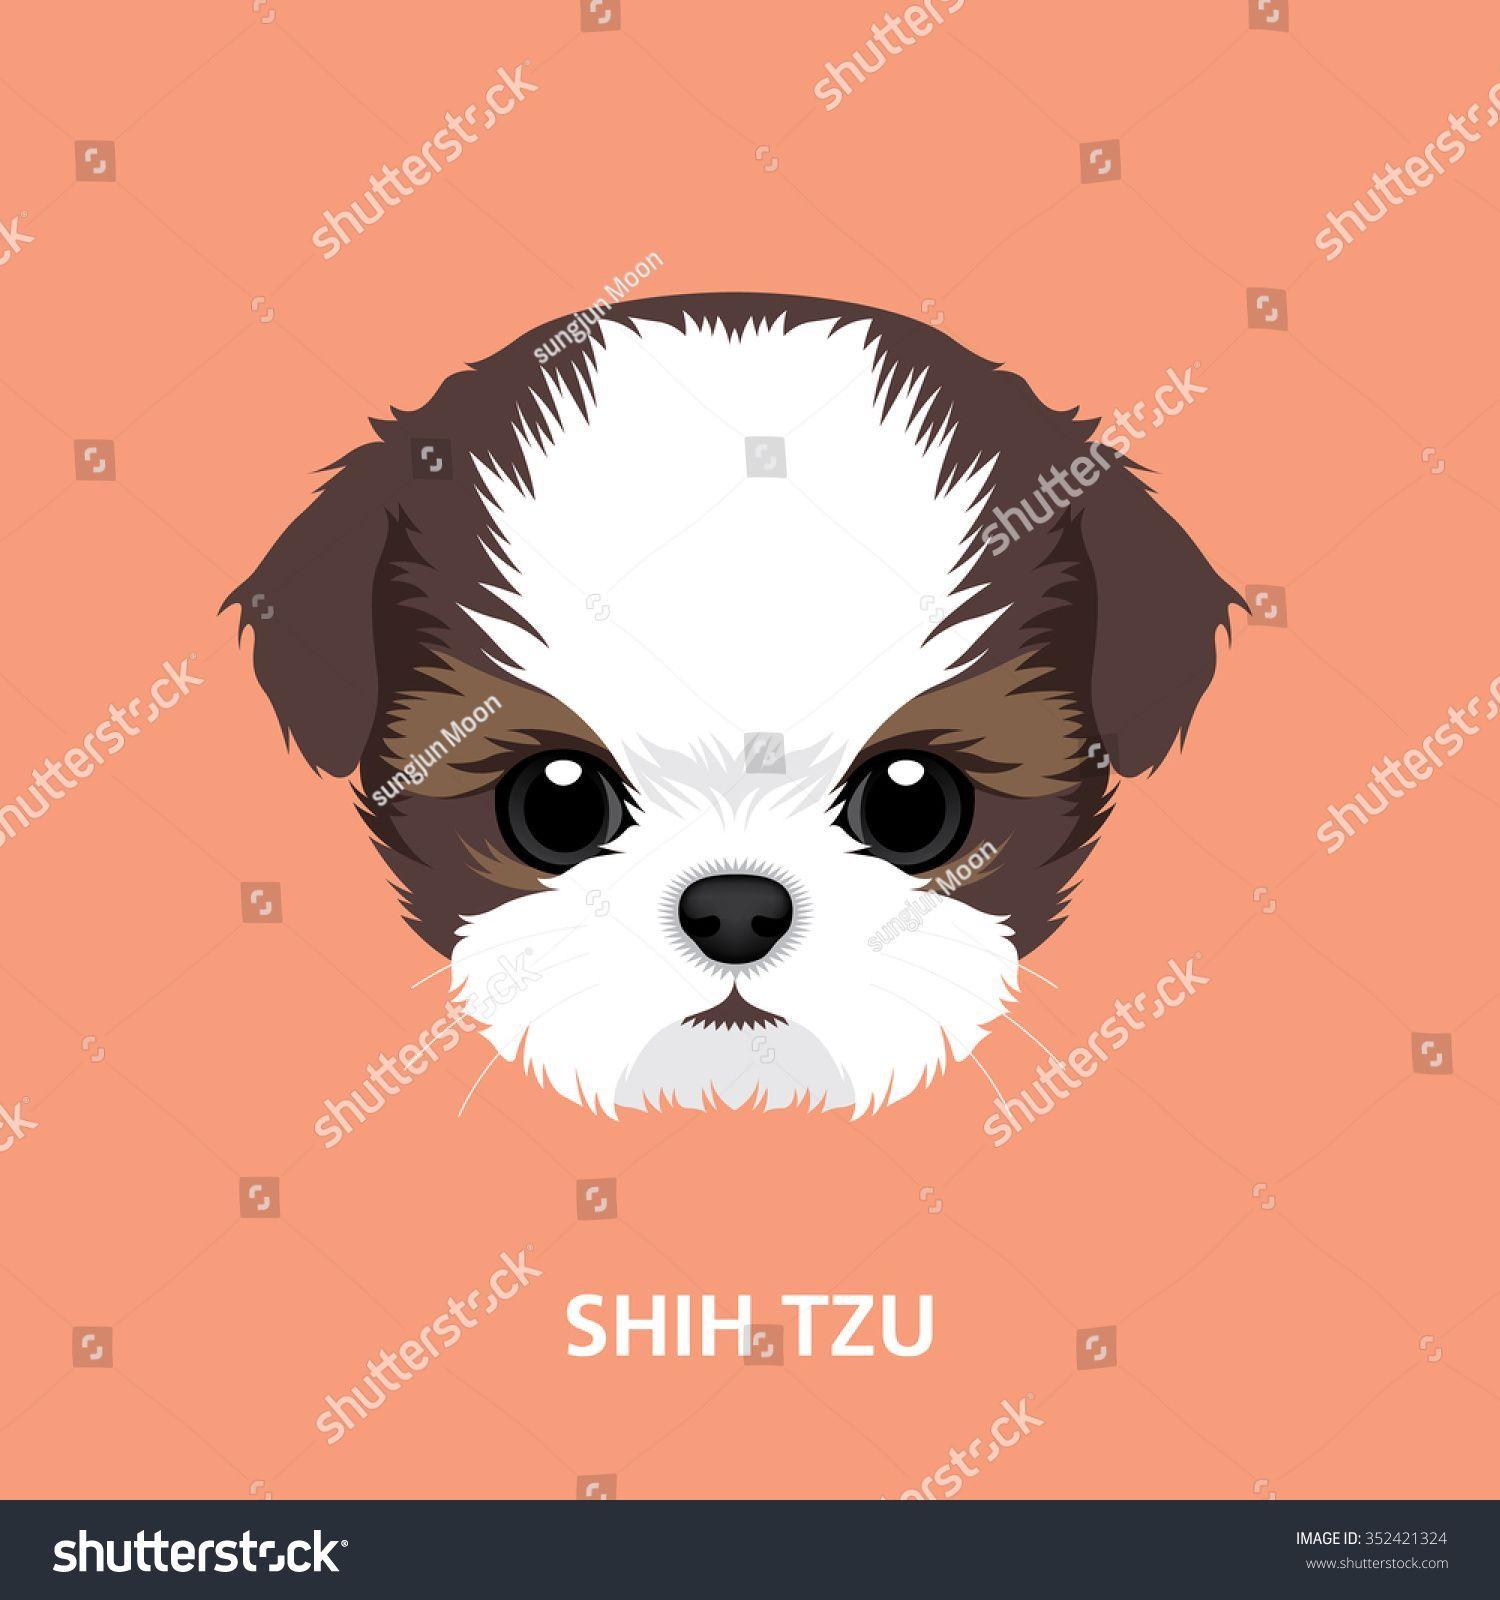 Vector Illustration Portrait Of Shih Tzu Puppy Art Of Dog Face